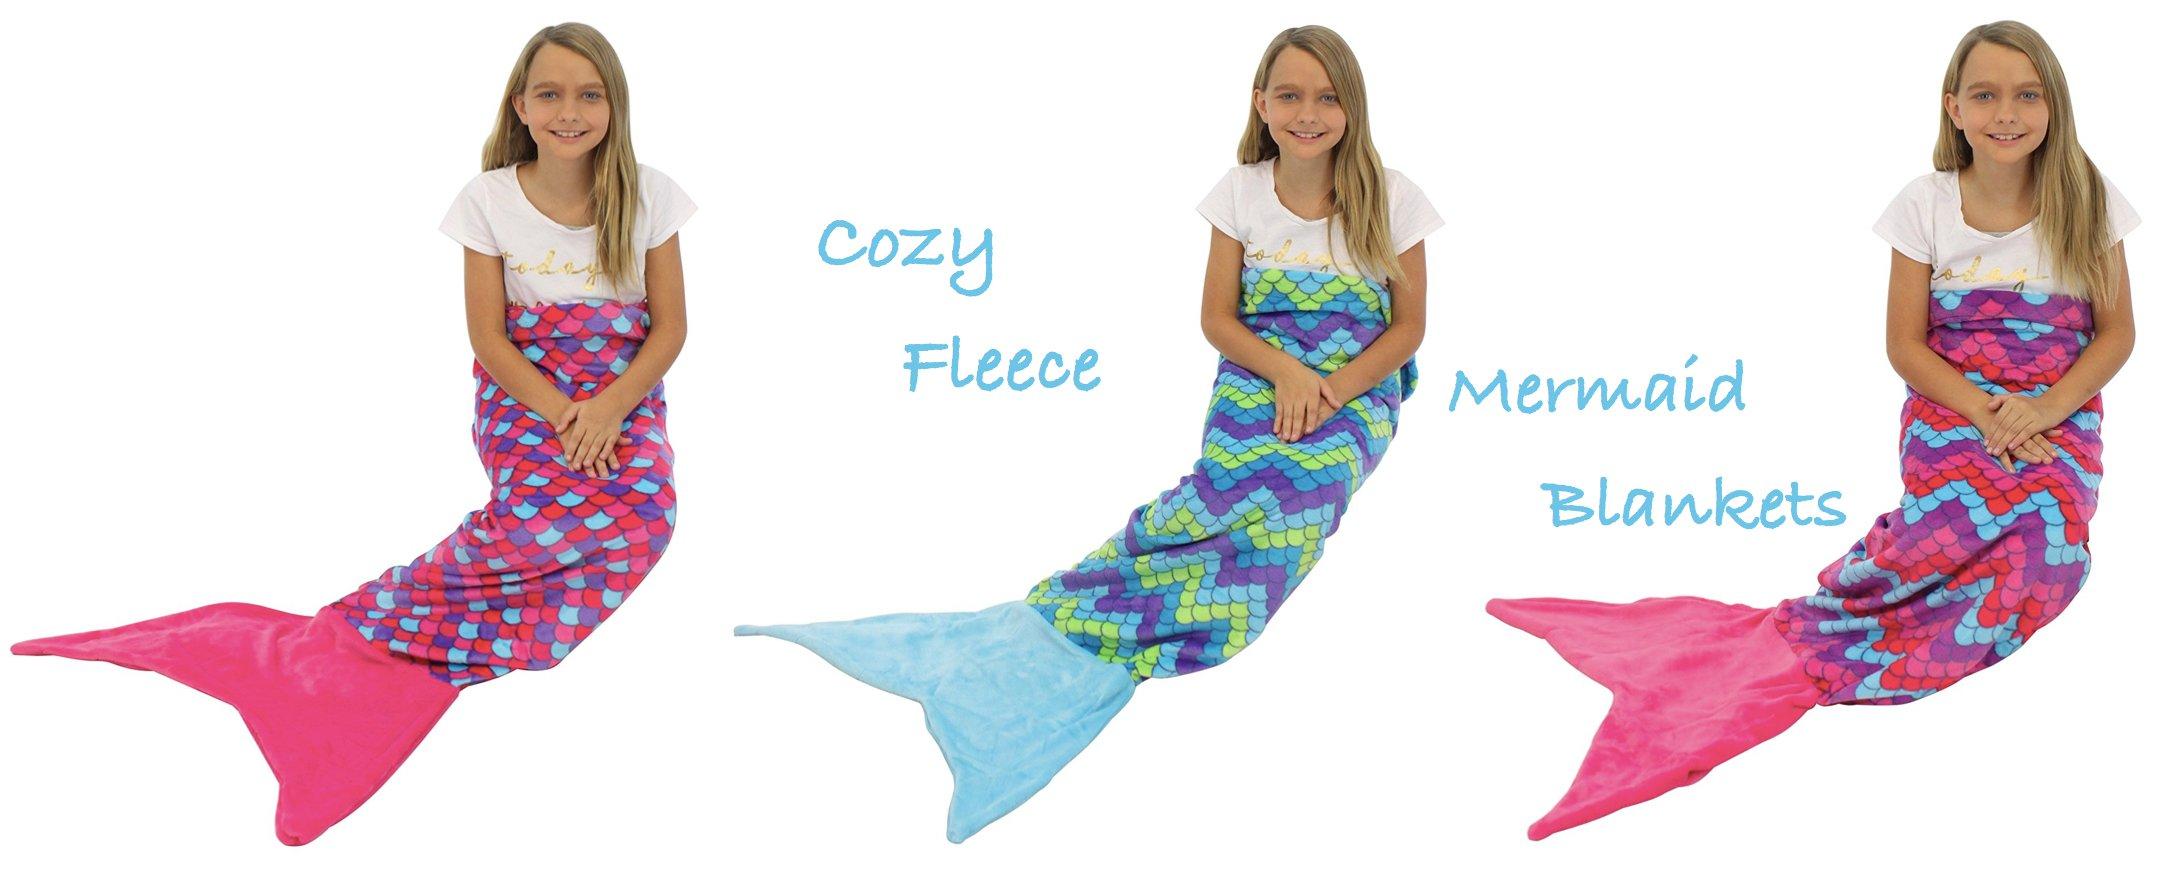 Cozy Fleece Mermaid Blankets